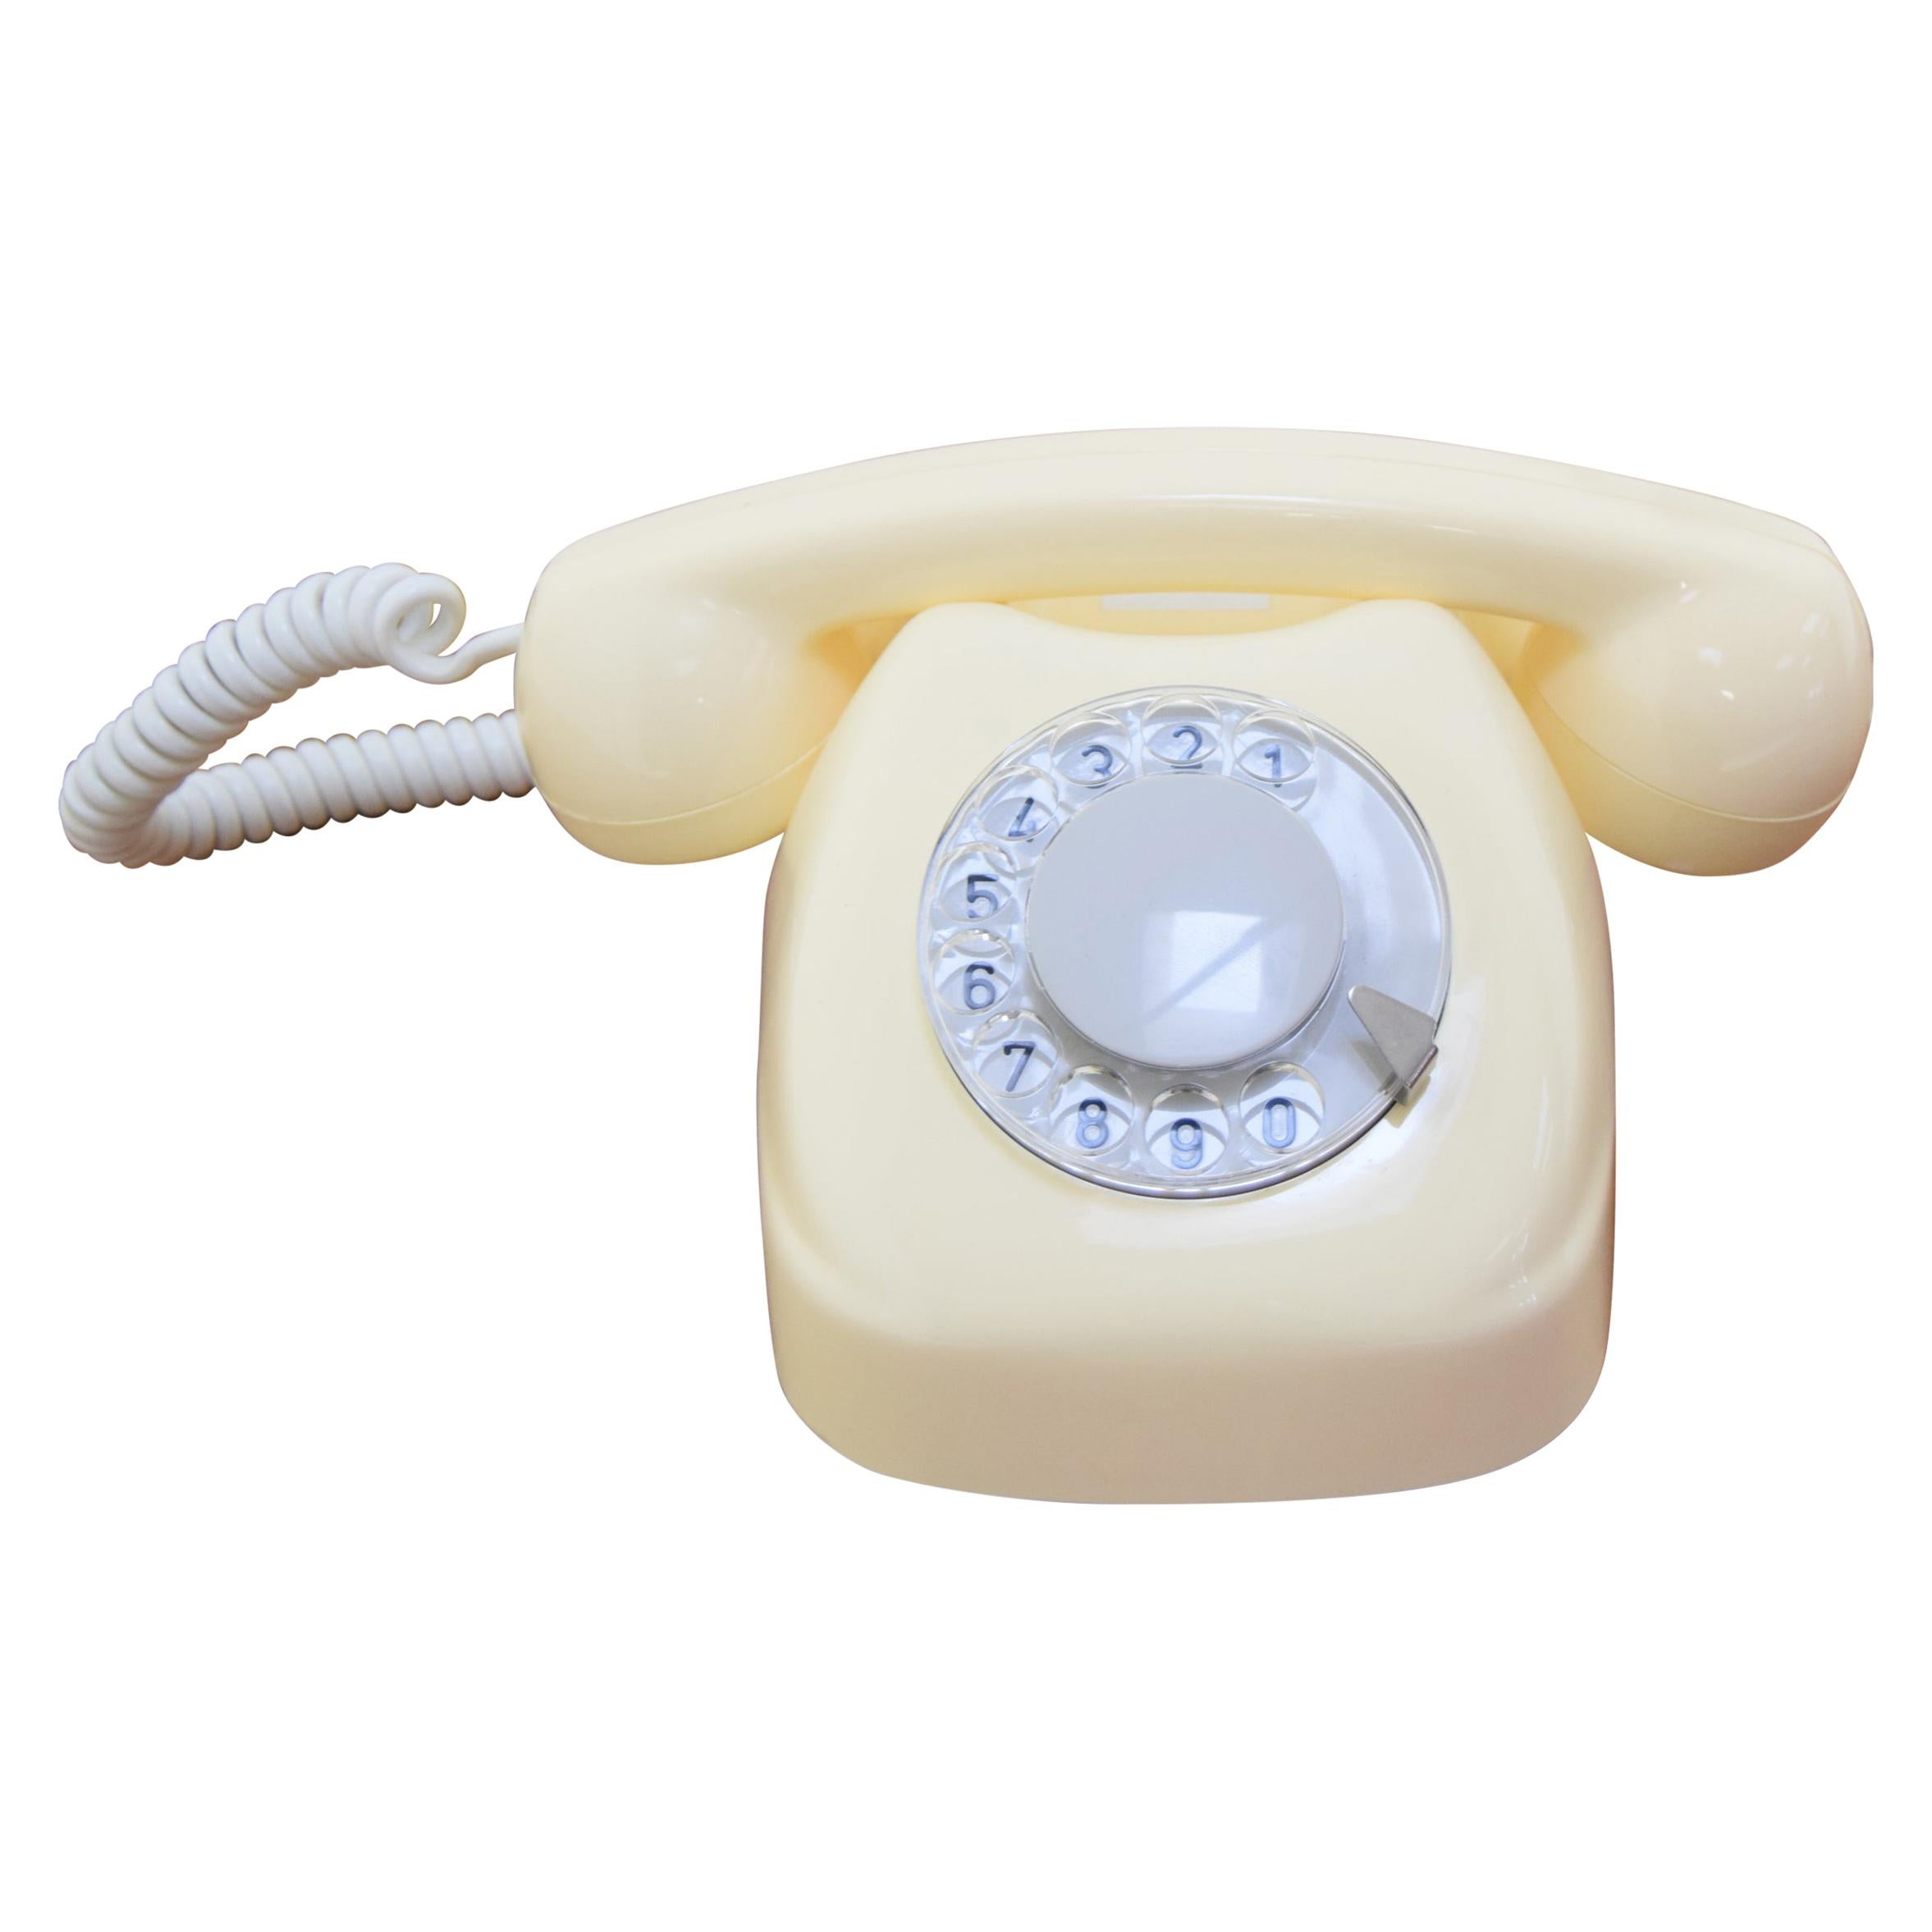 Mid-Century Design Telephone by Tesla, 1979